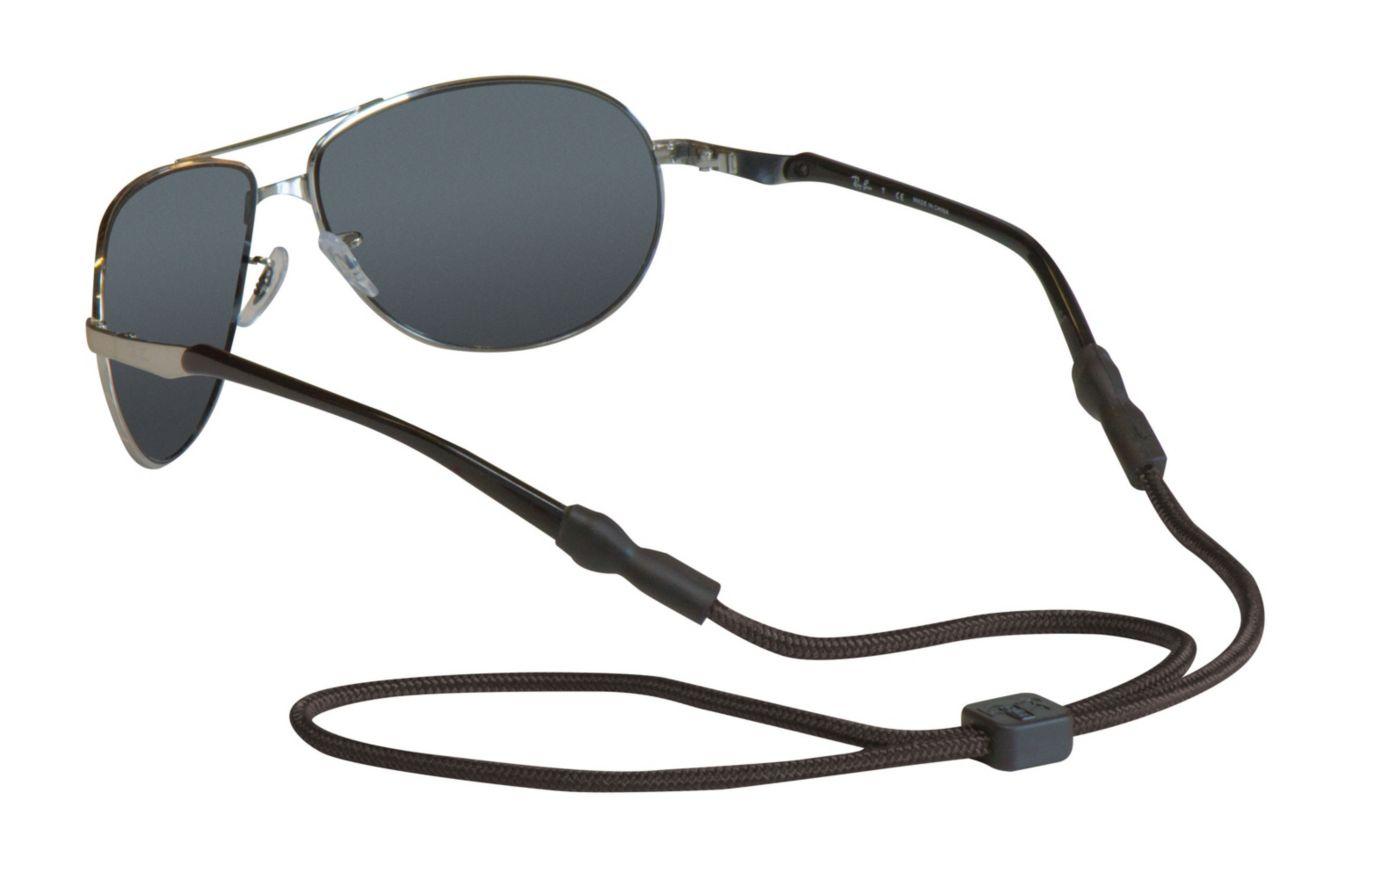 Chums Men's Power Cord Sunglasses Retainer